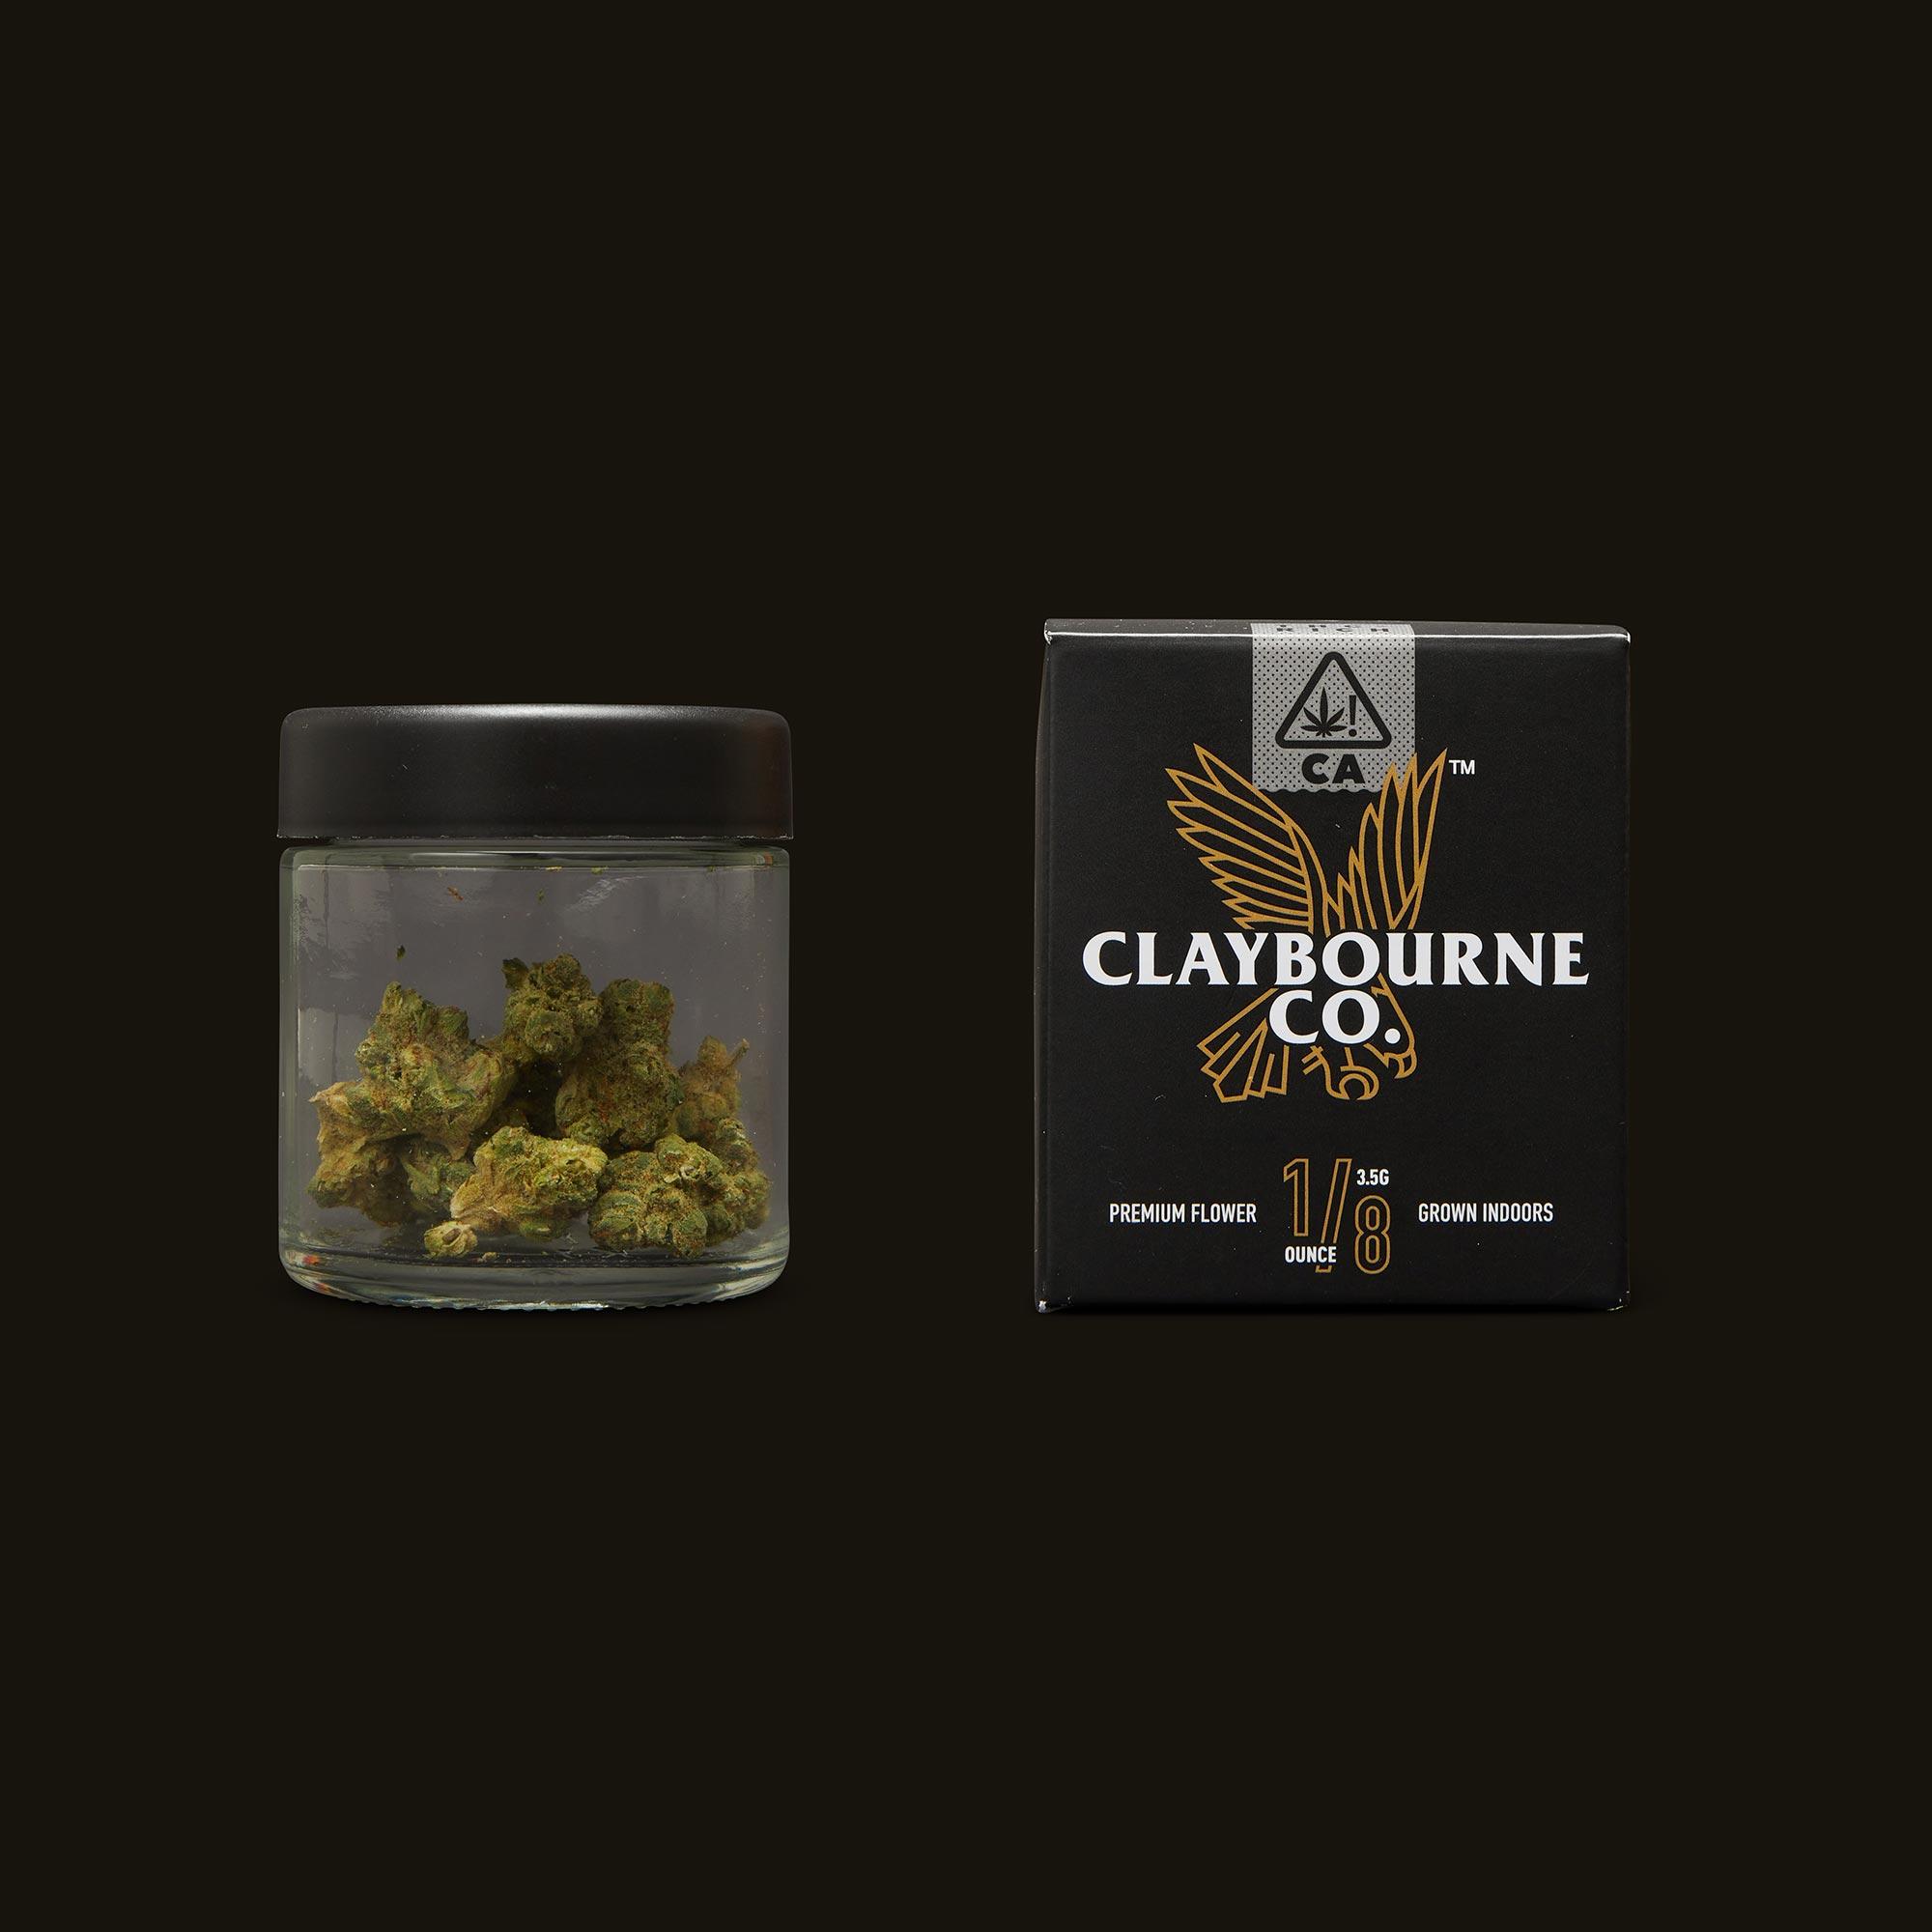 Claybourne Co. Brightfire OG Jar and Packaging